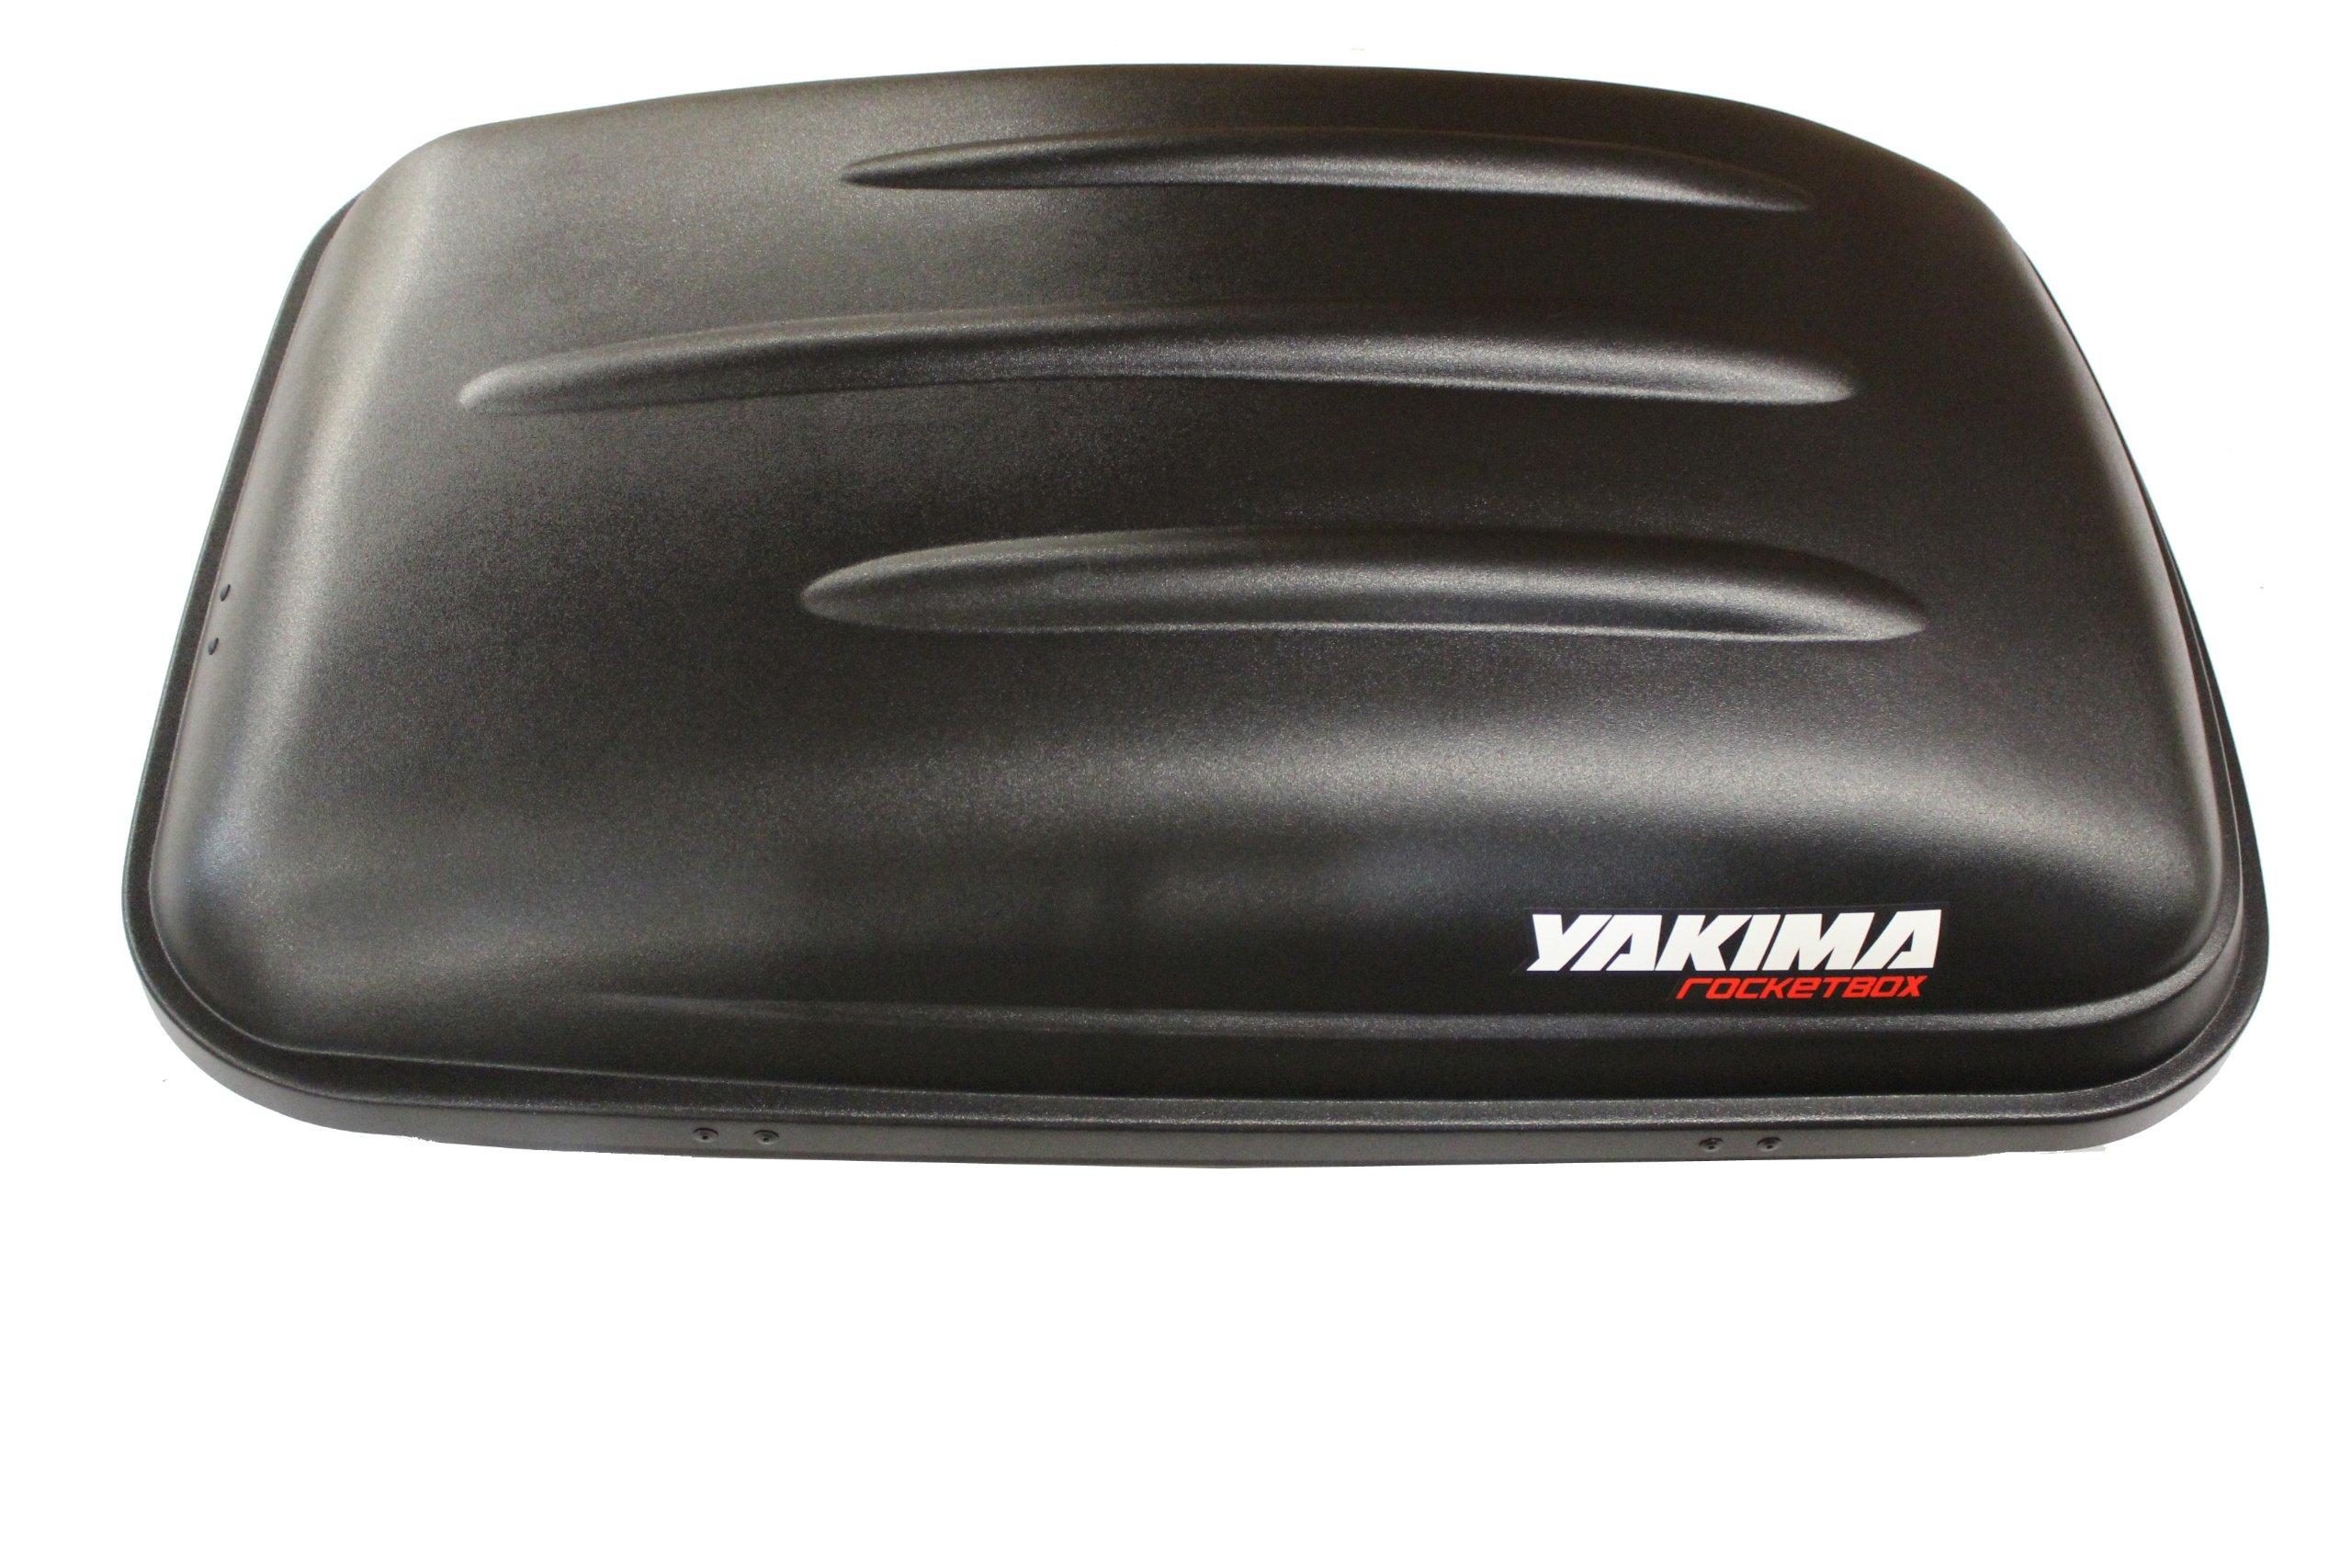 Genuine Kia Accessories UM000-AY00815 Roof Cargo Box by Kia